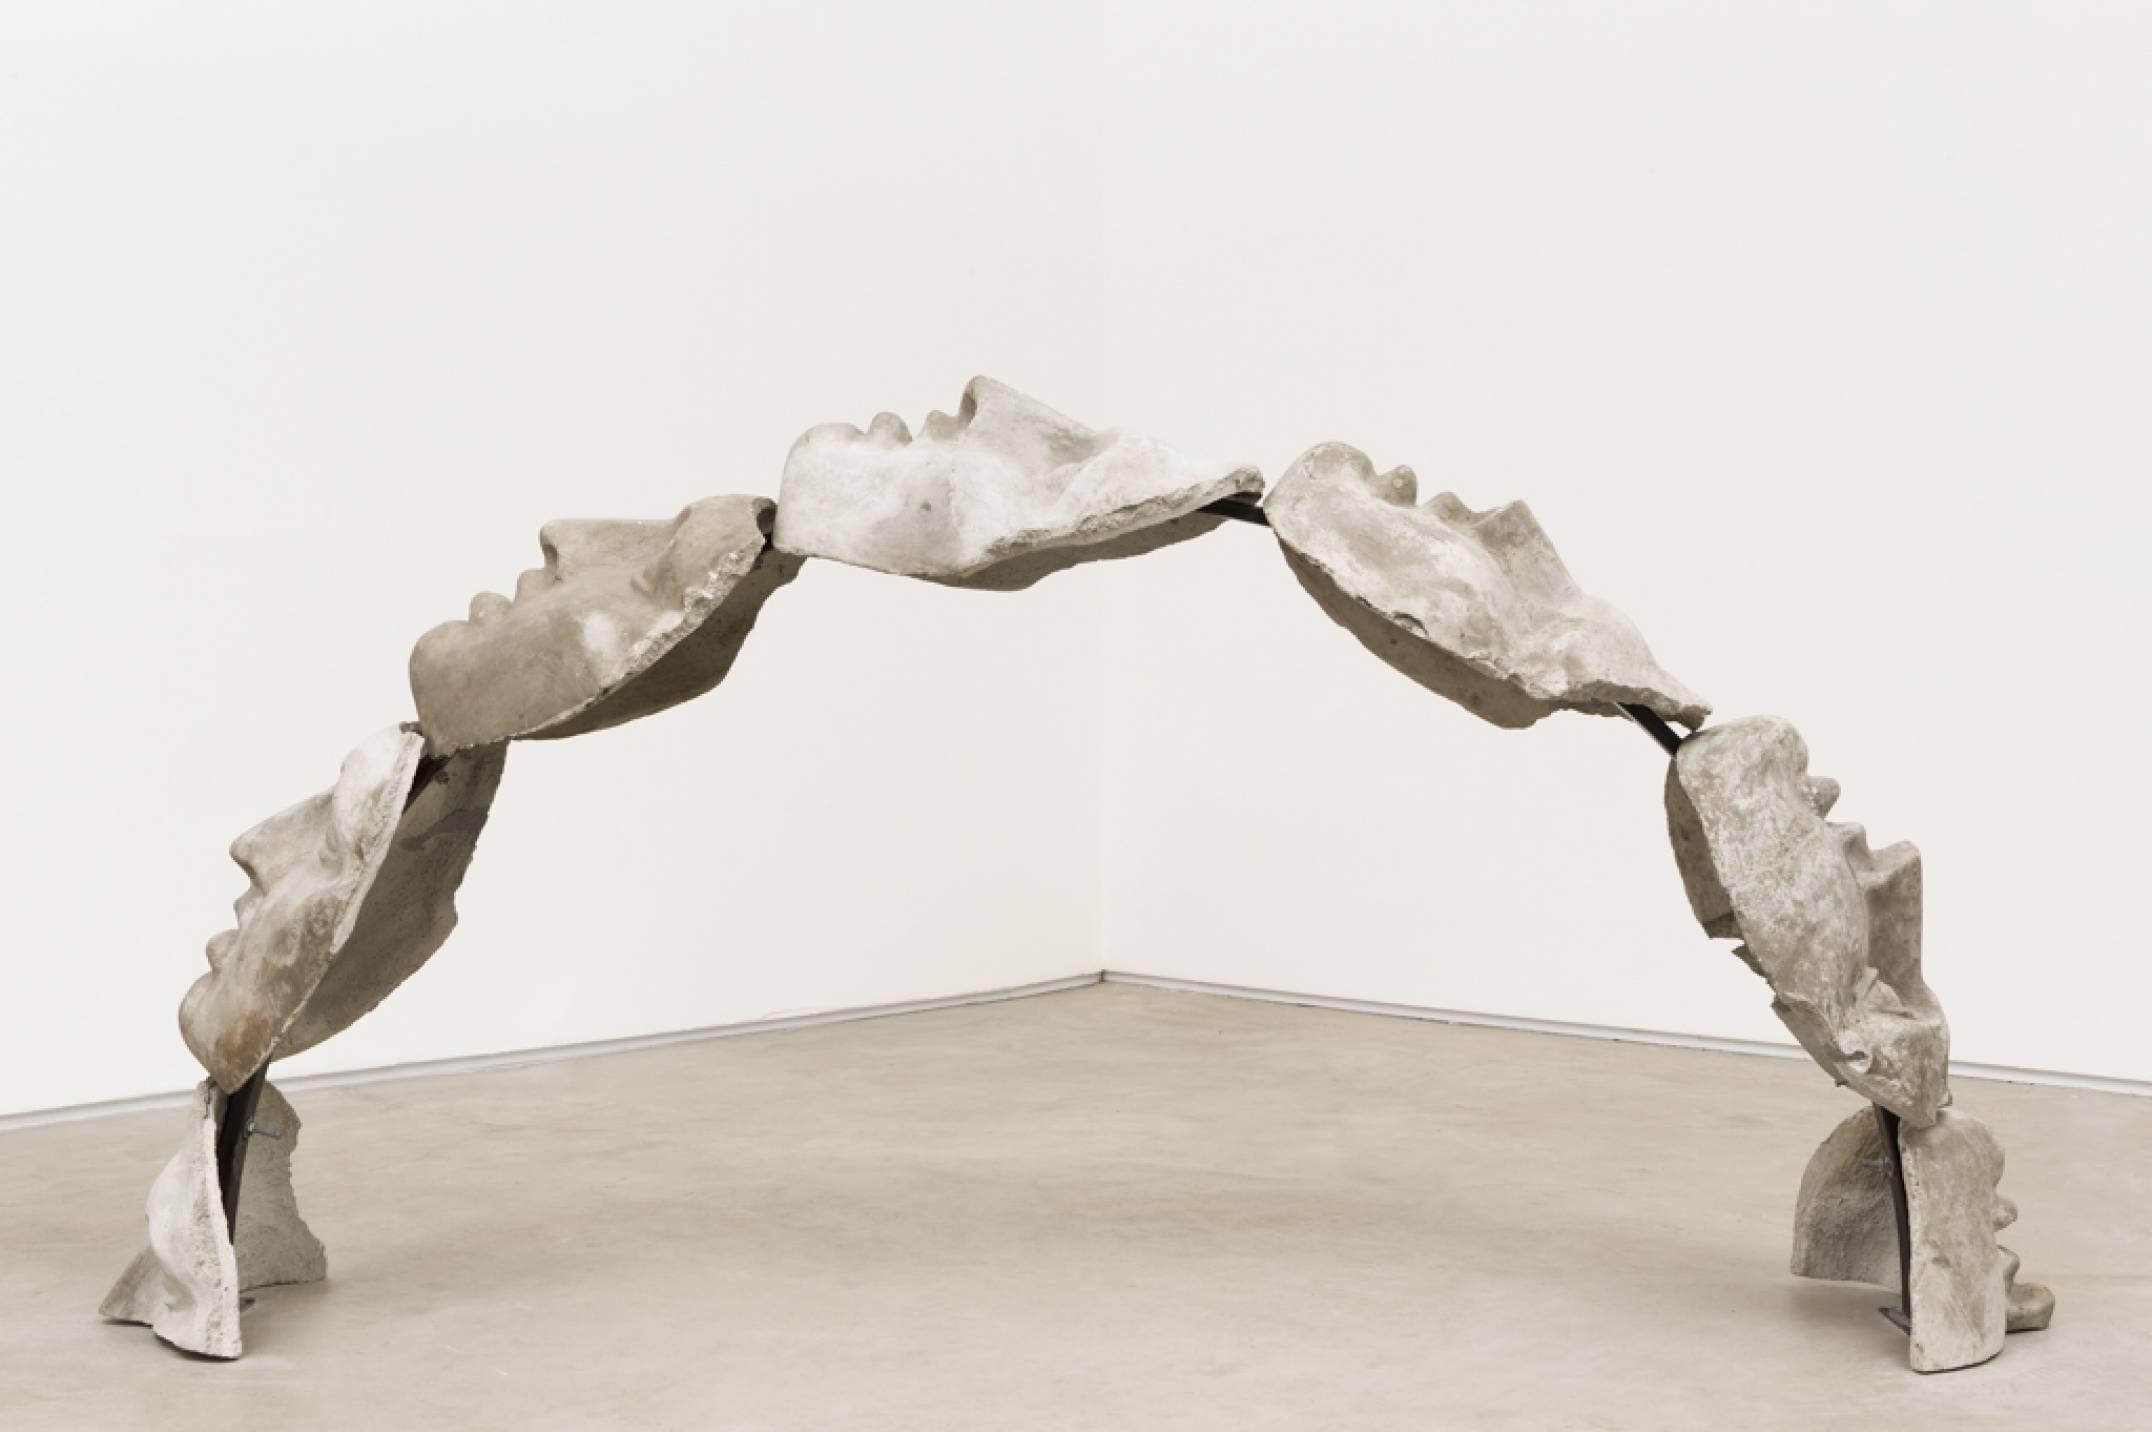 Roberto Winter,&nbsp;<em>Facebook Inc,</em> 2017, concrete, metal chains, 200 × 150 × 50 cm - Mendes Wood DM